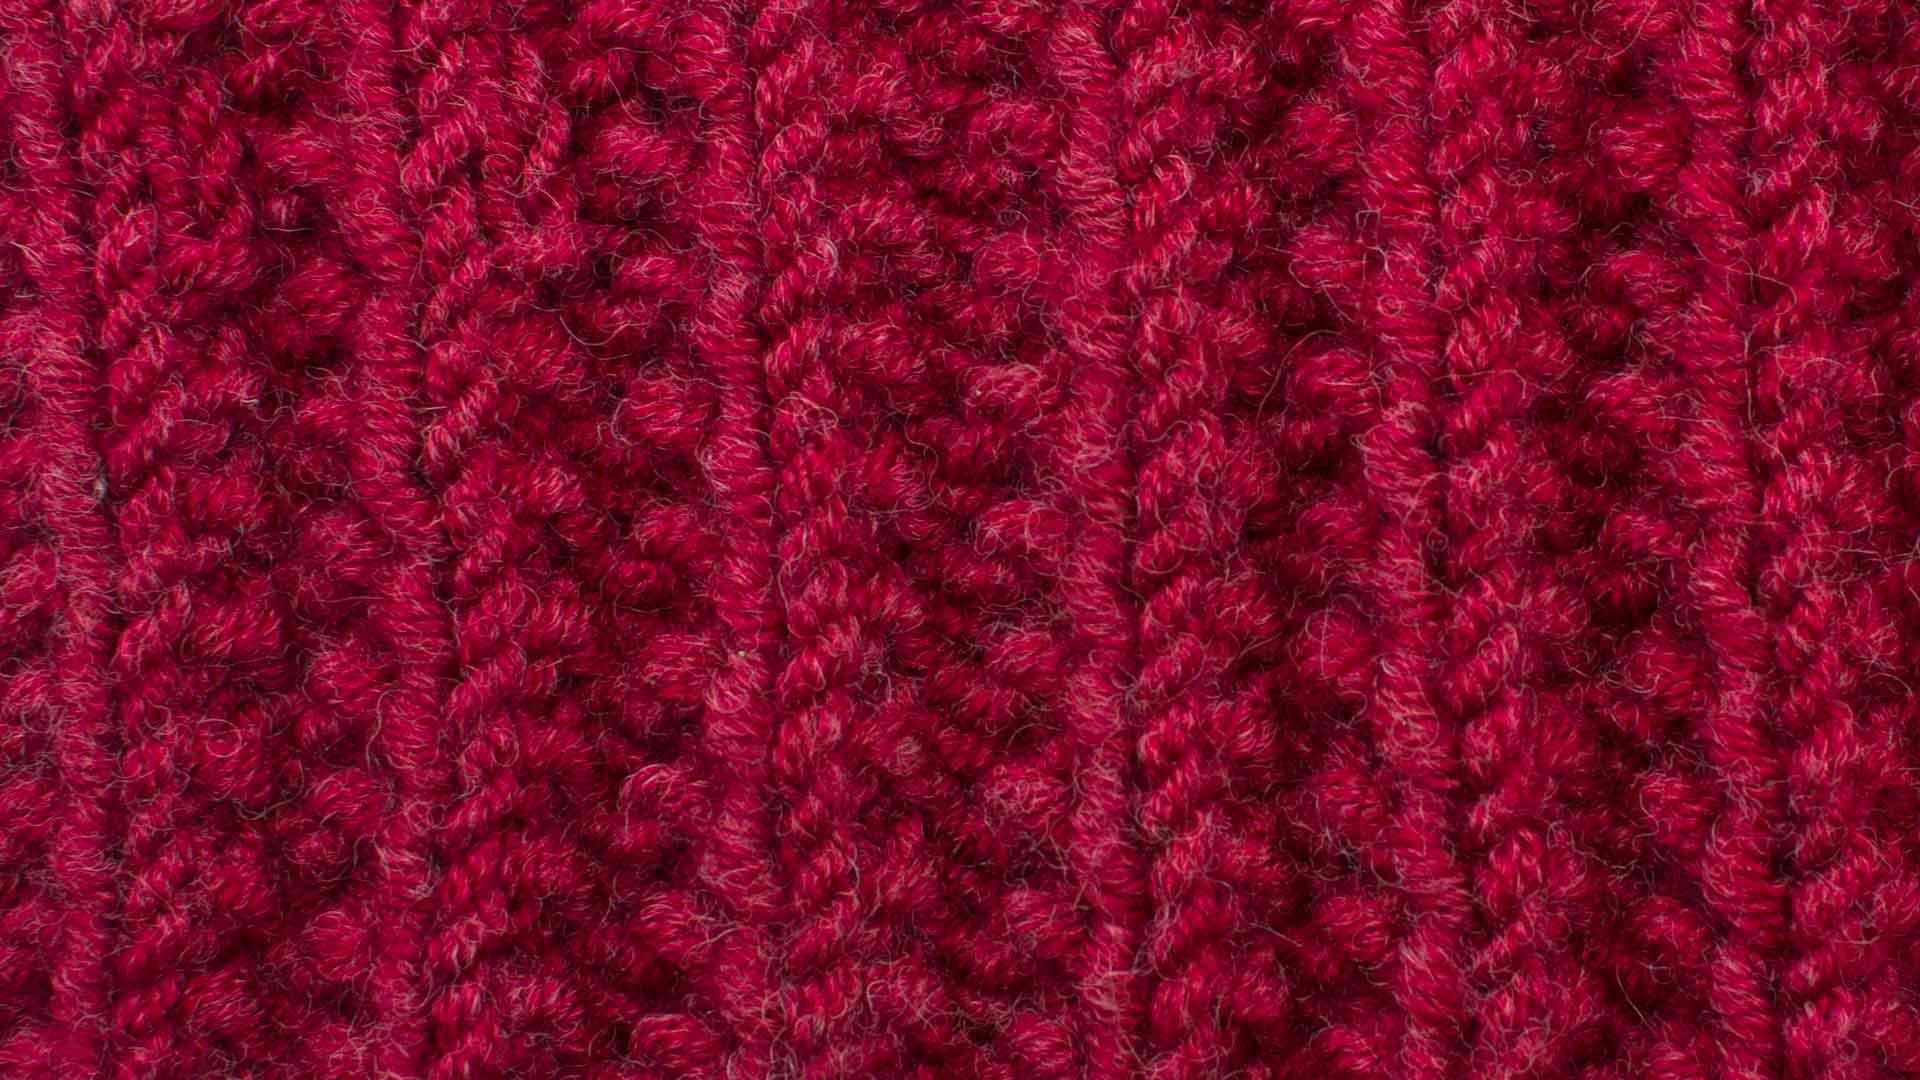 knitting stitches the mistake rib stitch :: knitting stitch #529 XTRARAQ